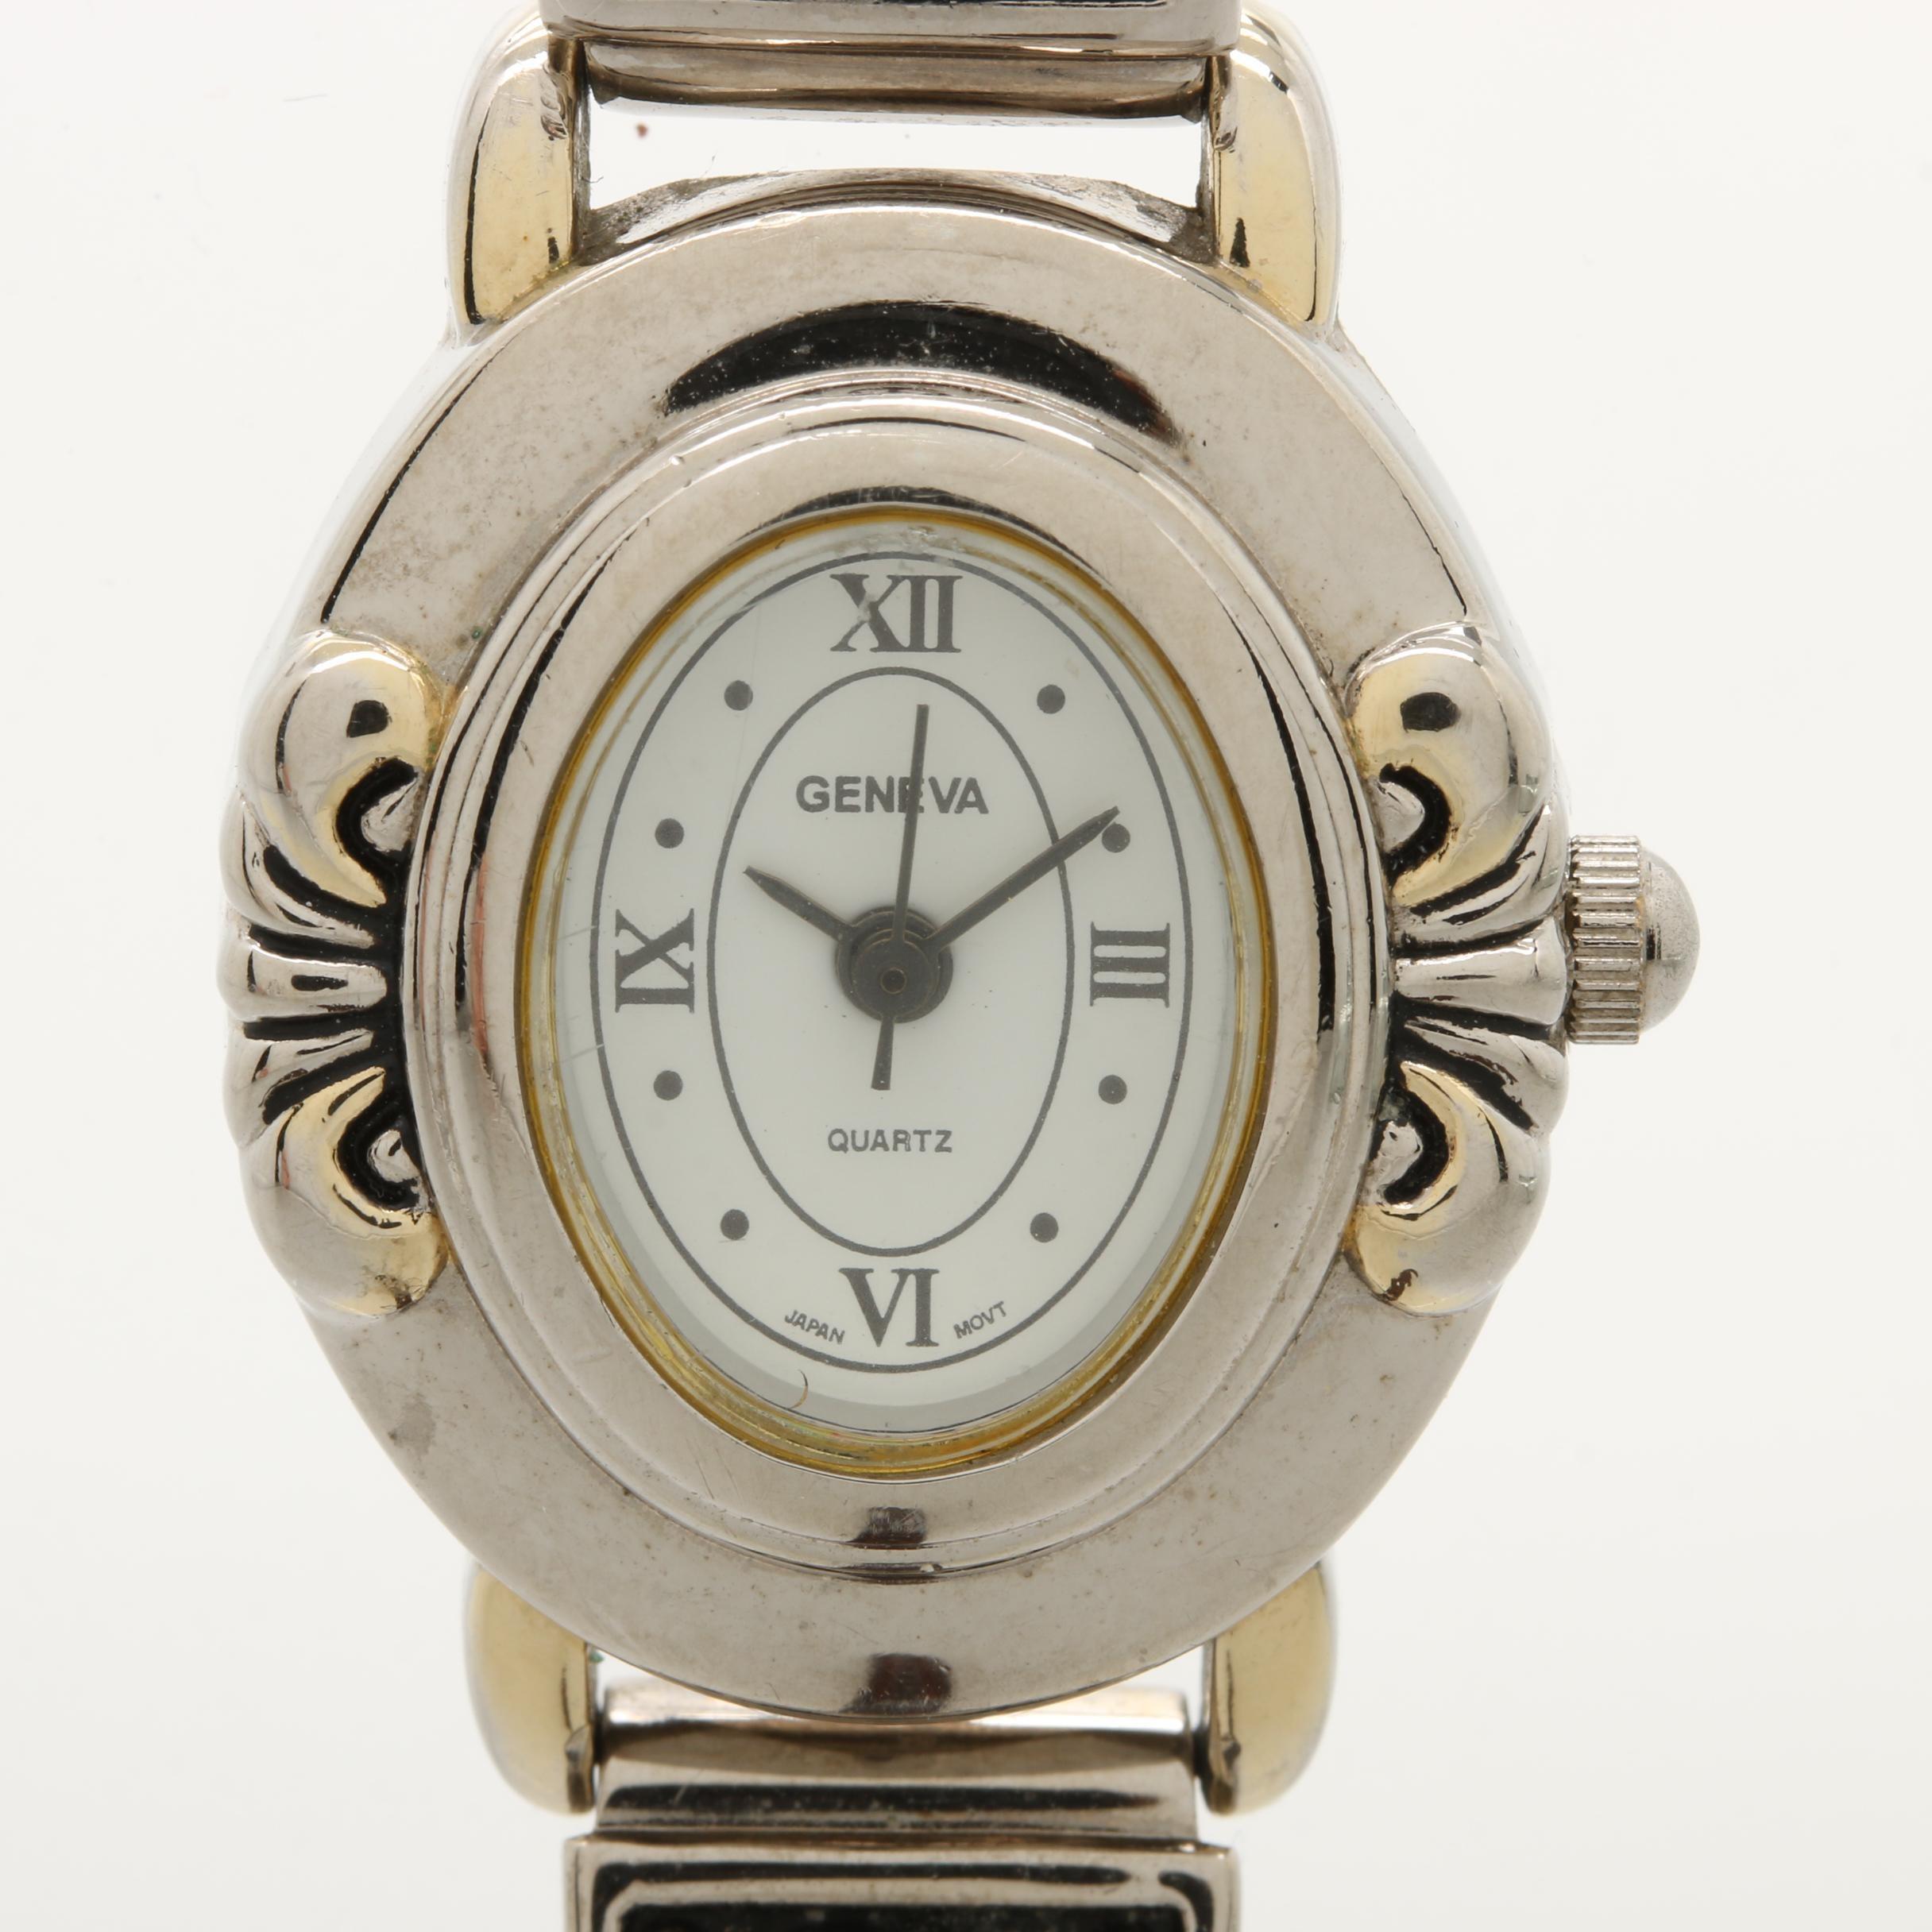 Geneva Quartz Silver Tone Wristwatch